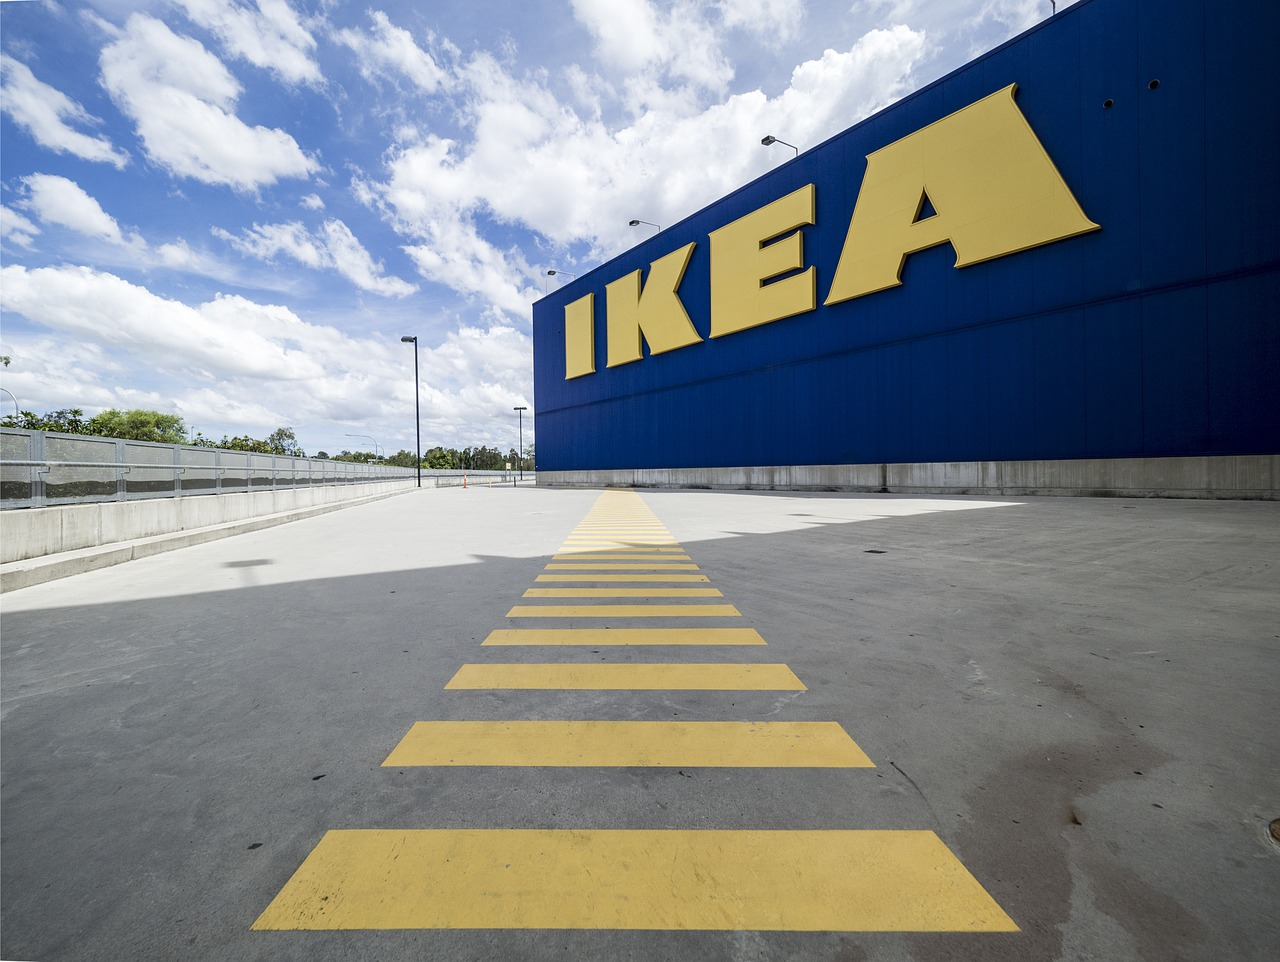 IKEA Looks to Expand to Broomfield CO